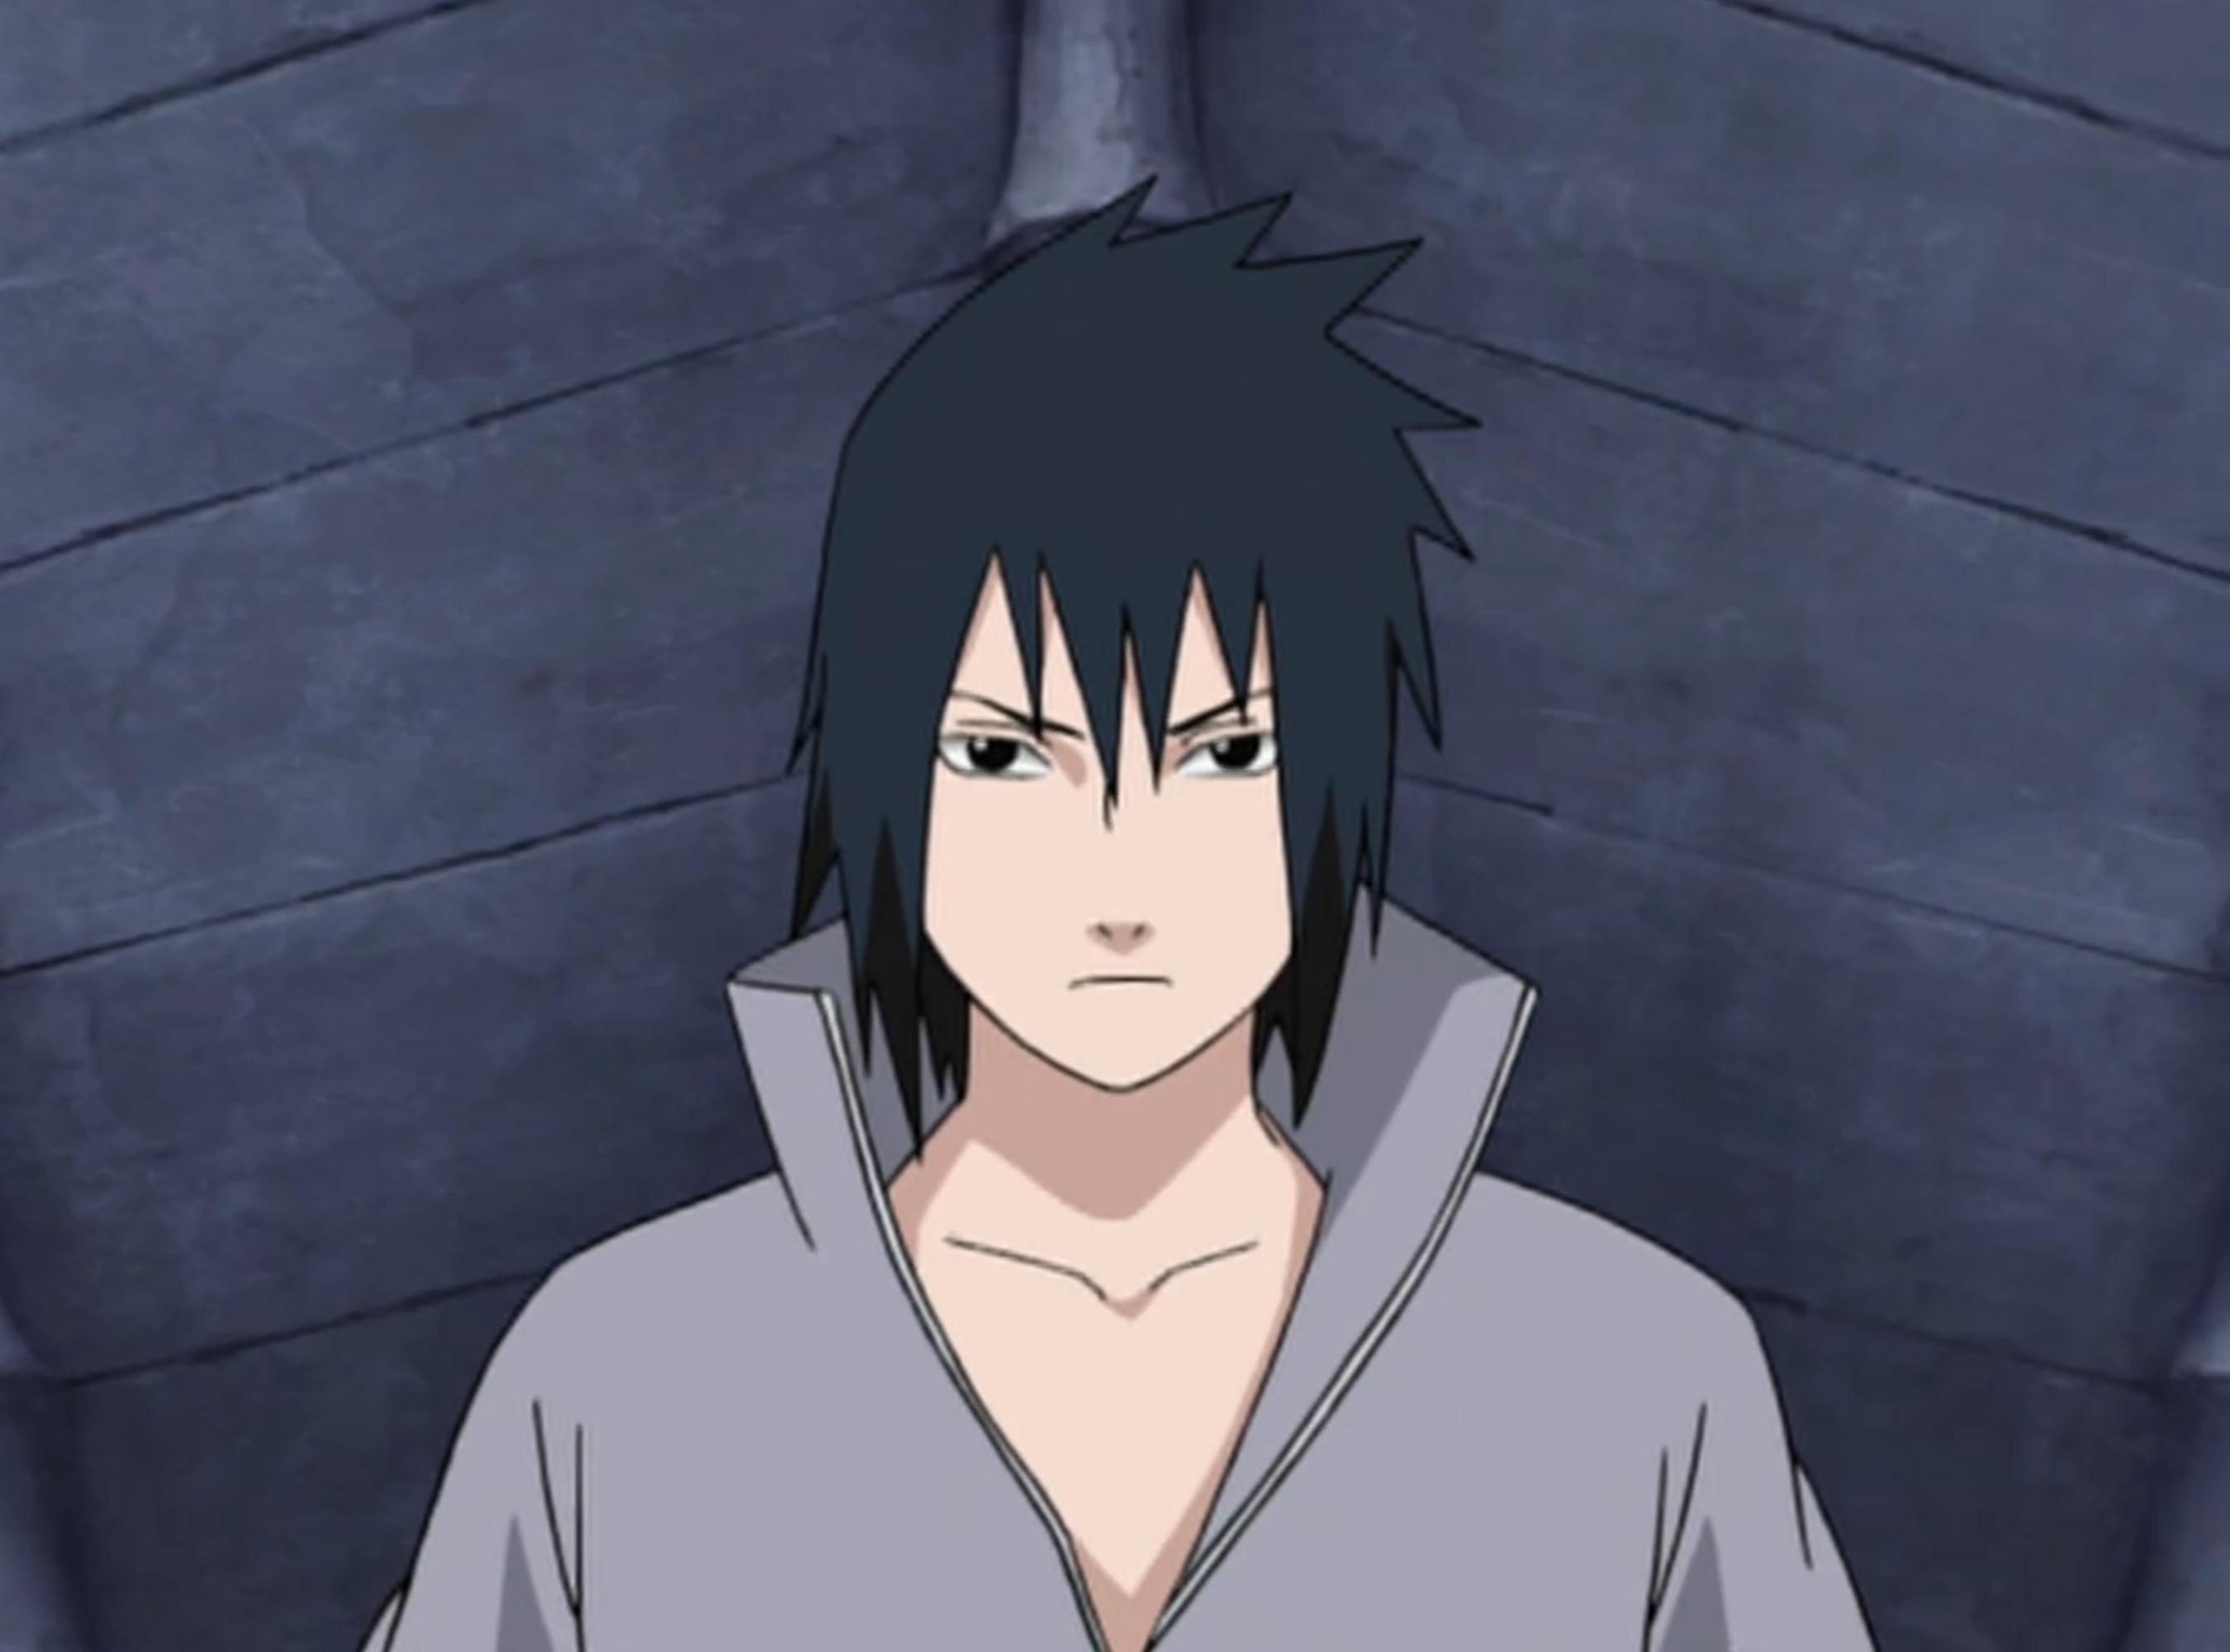 Fil:Sasuke Part 2.png